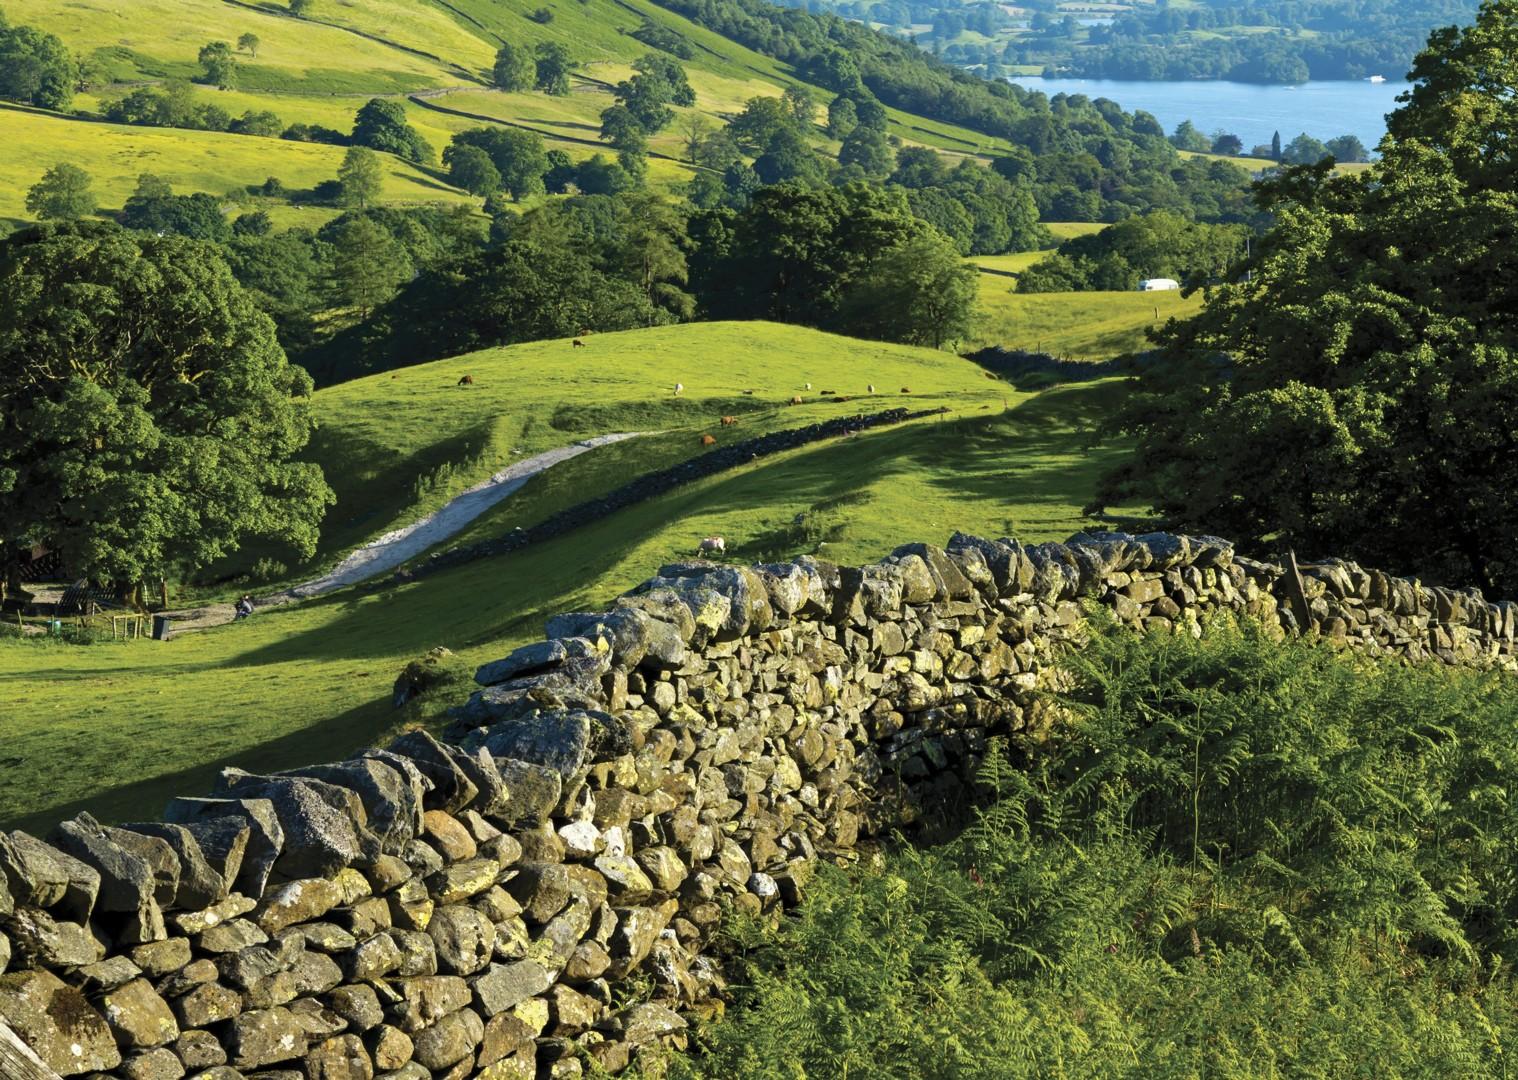 leisure-cycling-holiday-lakedistrict-derwentbank-nature.jpg - UK - Lake District - Derwent Water - Guided Leisure Cycling Holiday - Leisure Cycling